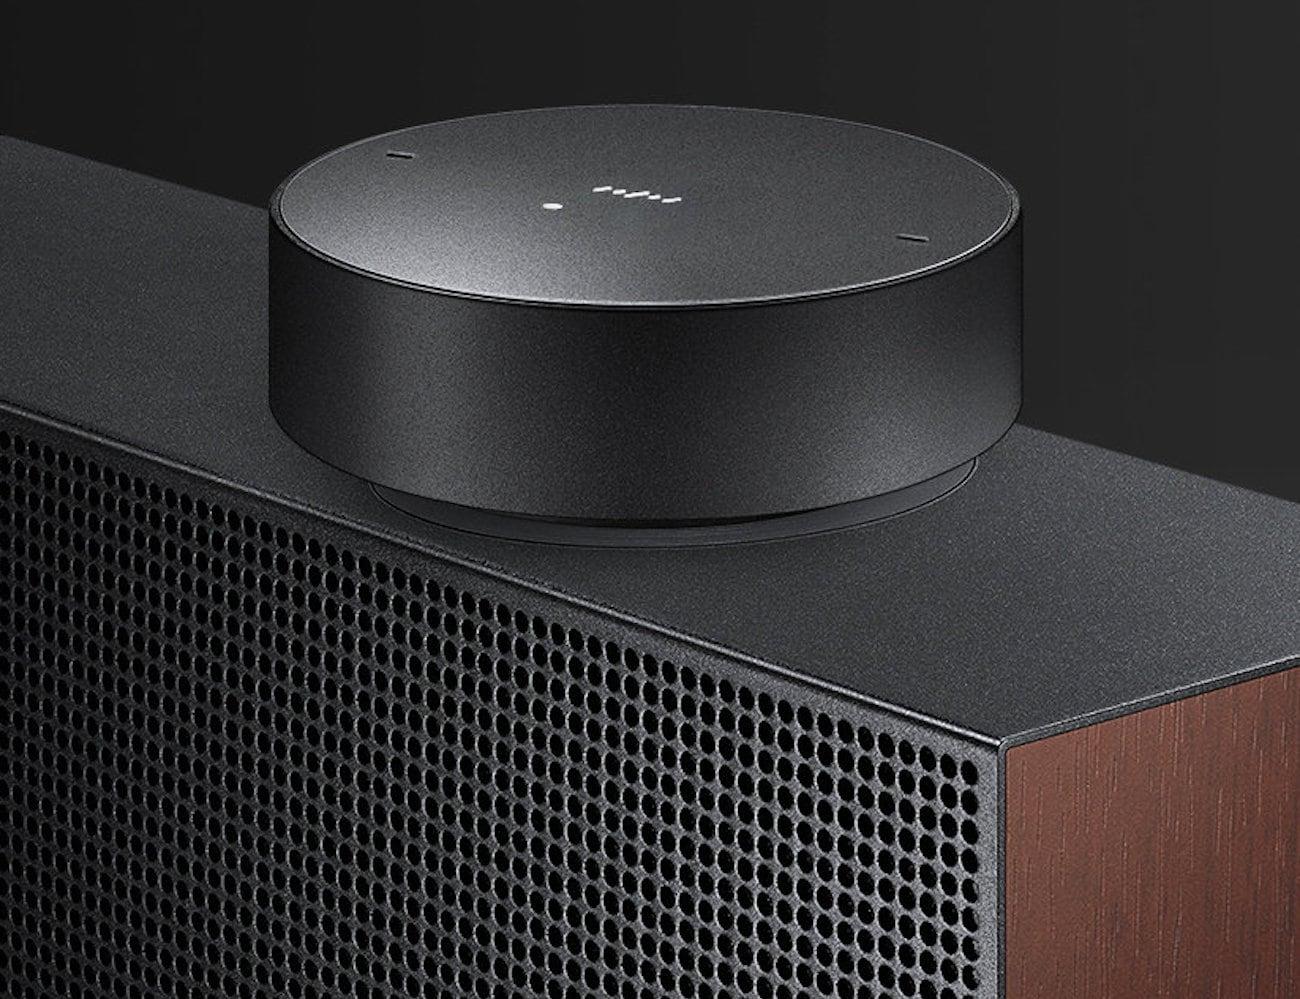 Samsung VL5 Wireless Hi-Fi Speaker